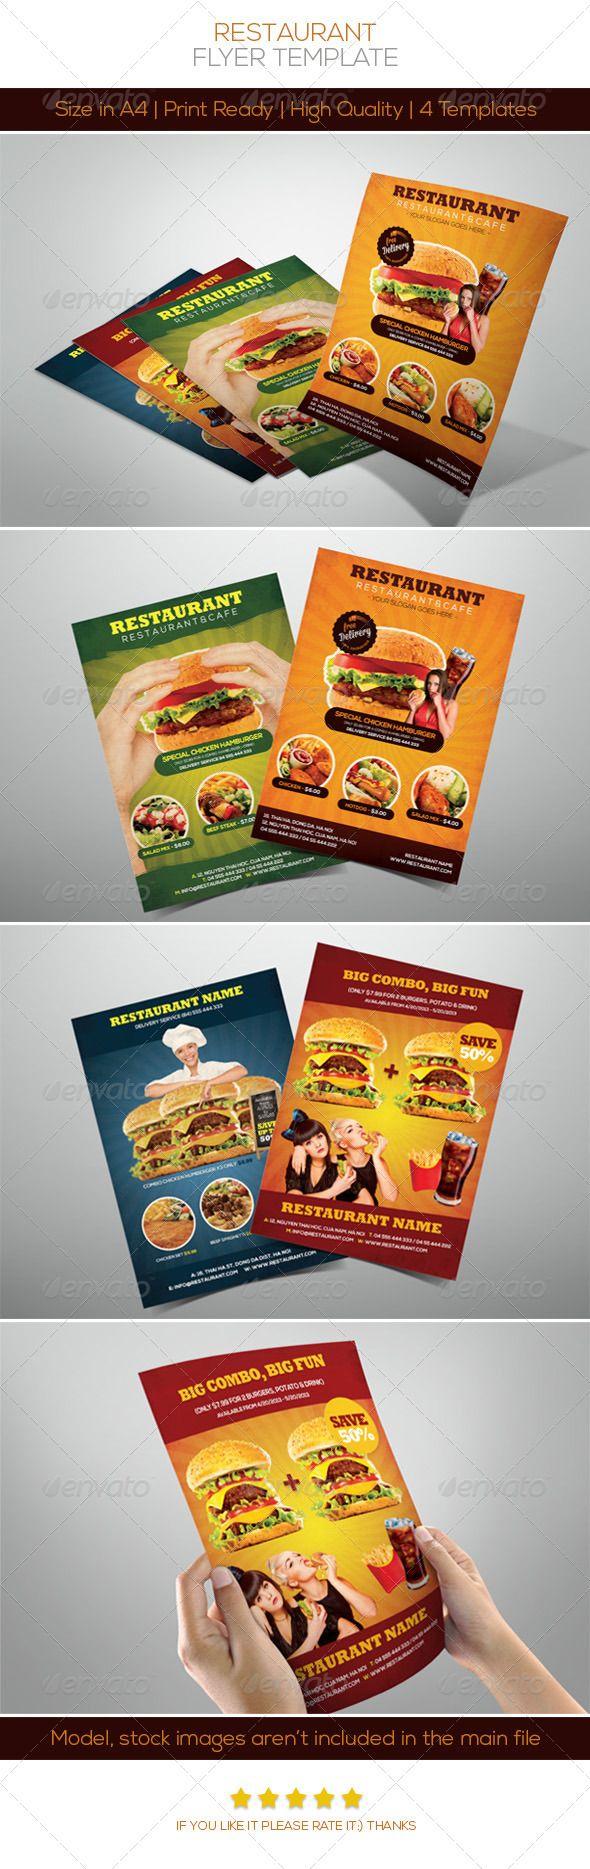 Premium Restaurant Flyers  Restaurants Print Templates And Fonts